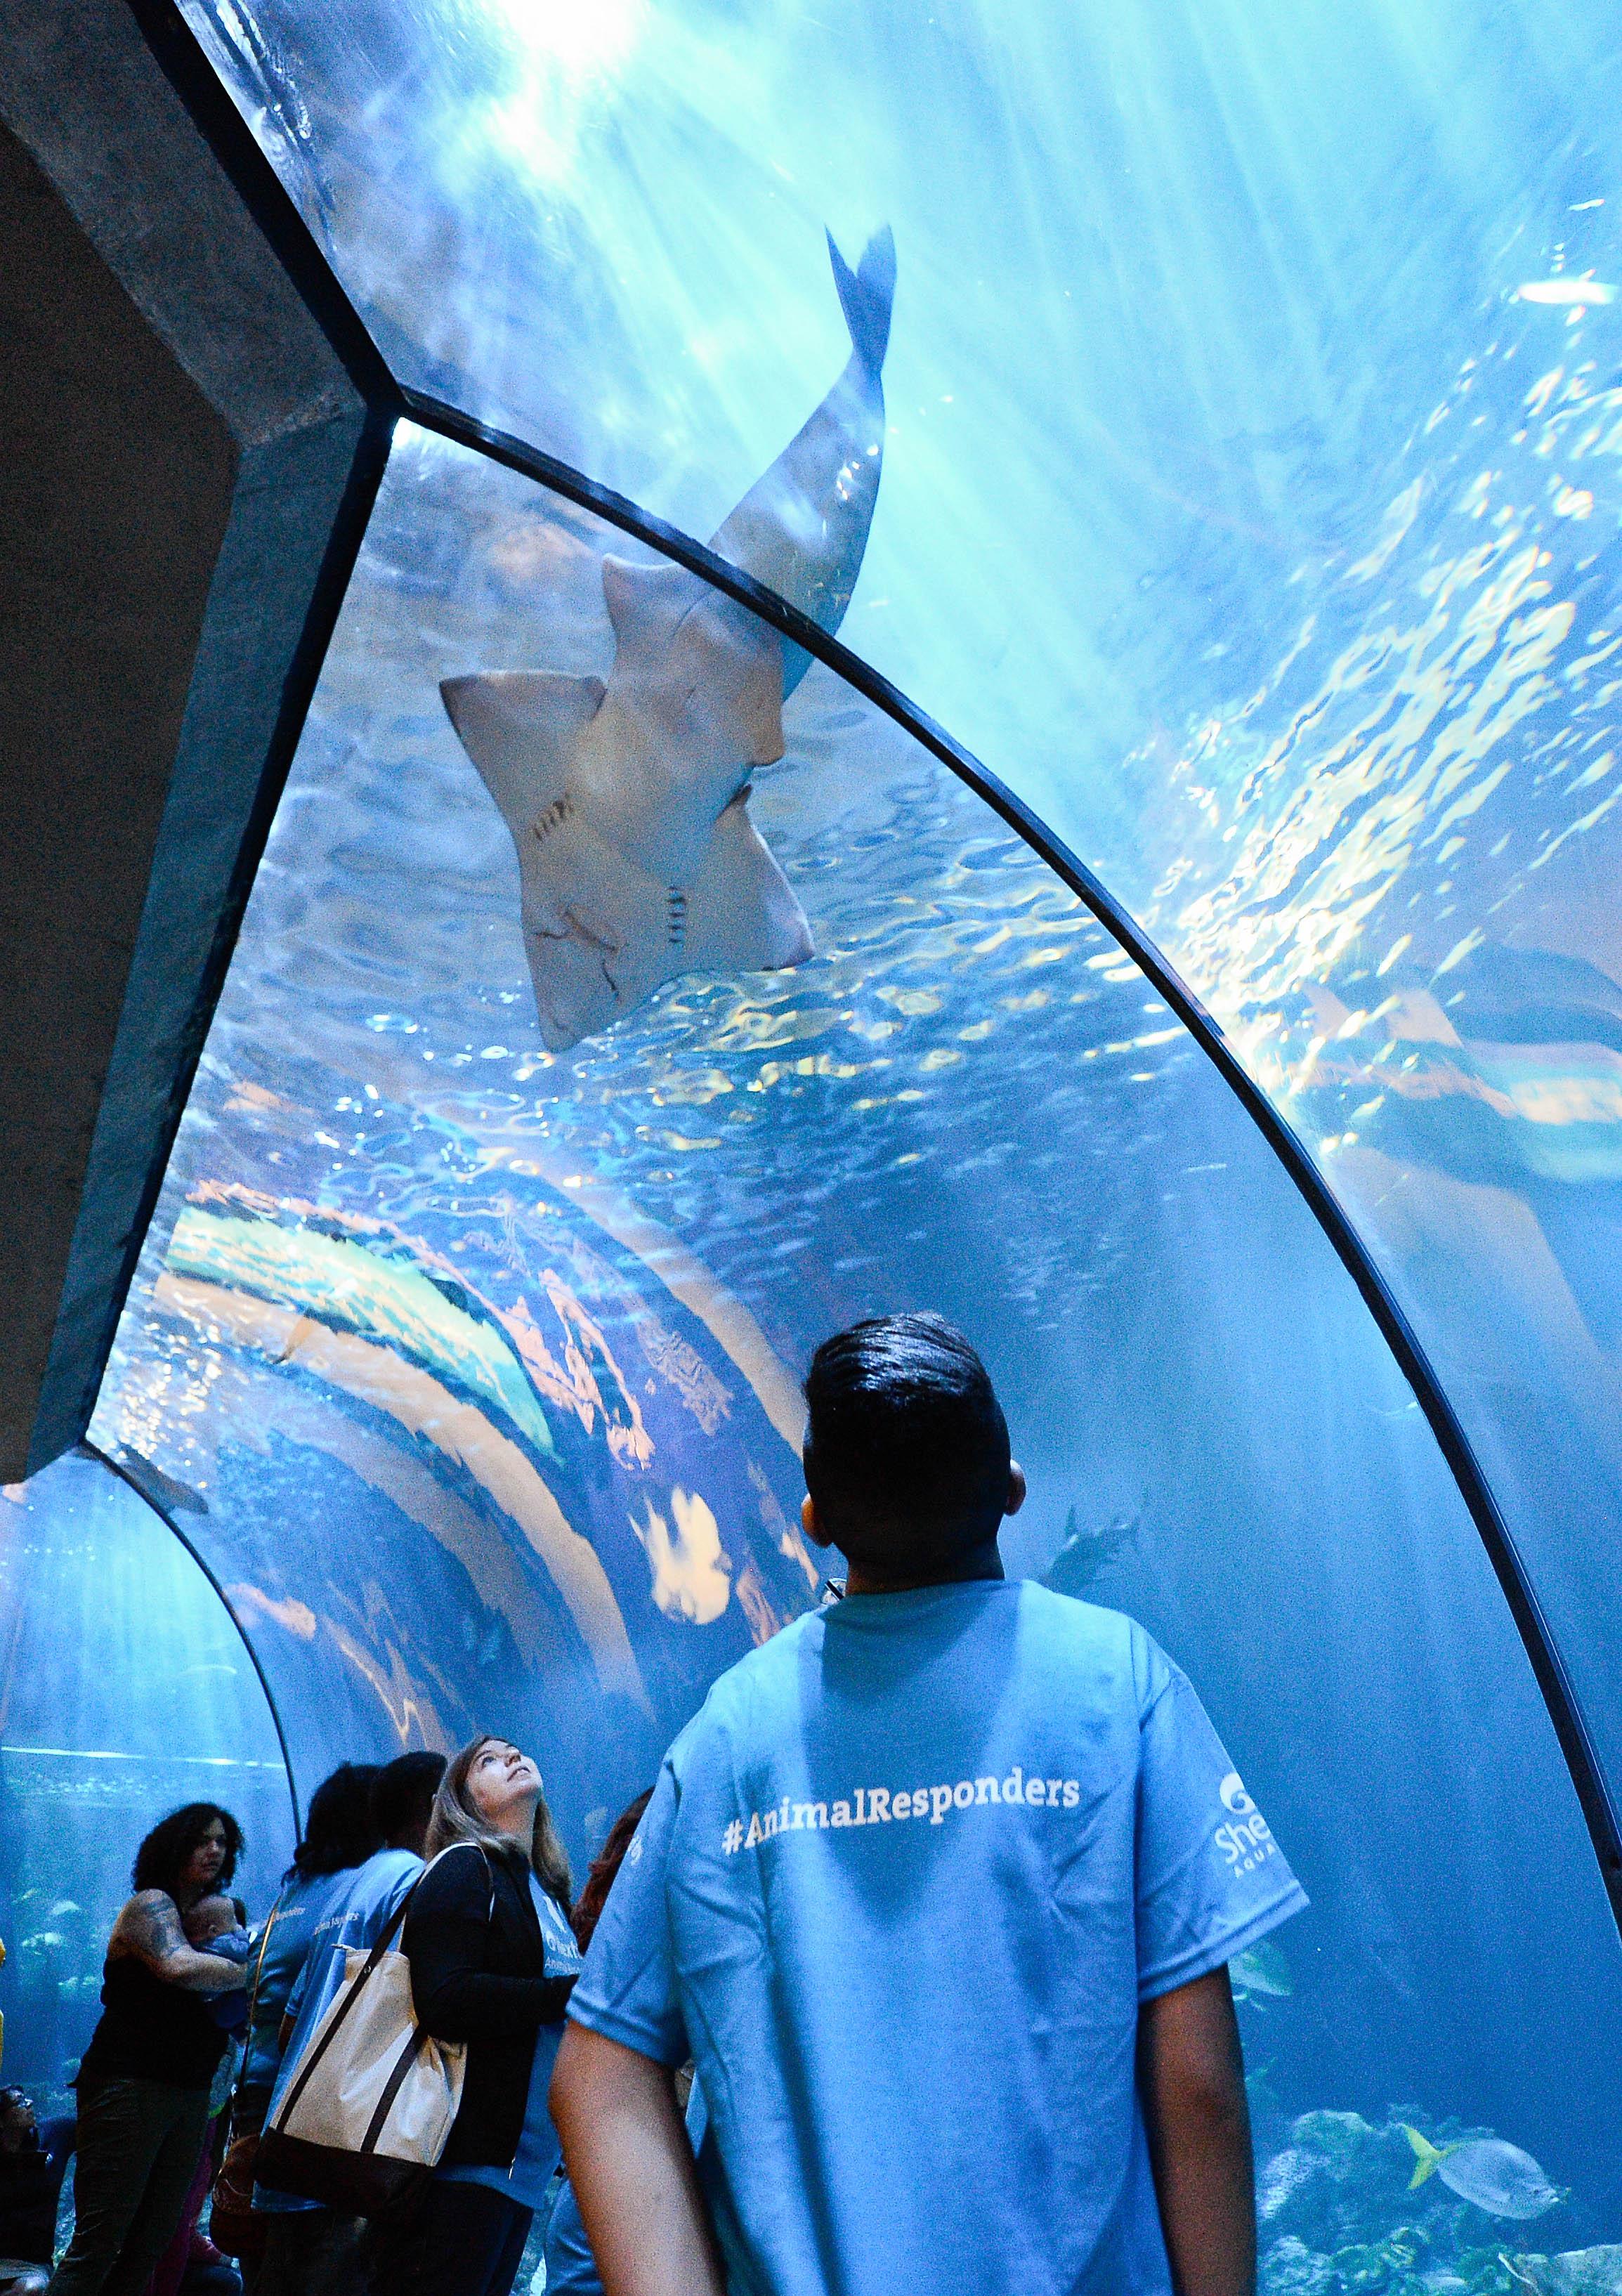 Dish Soap And Shedd Aquarium Crown The